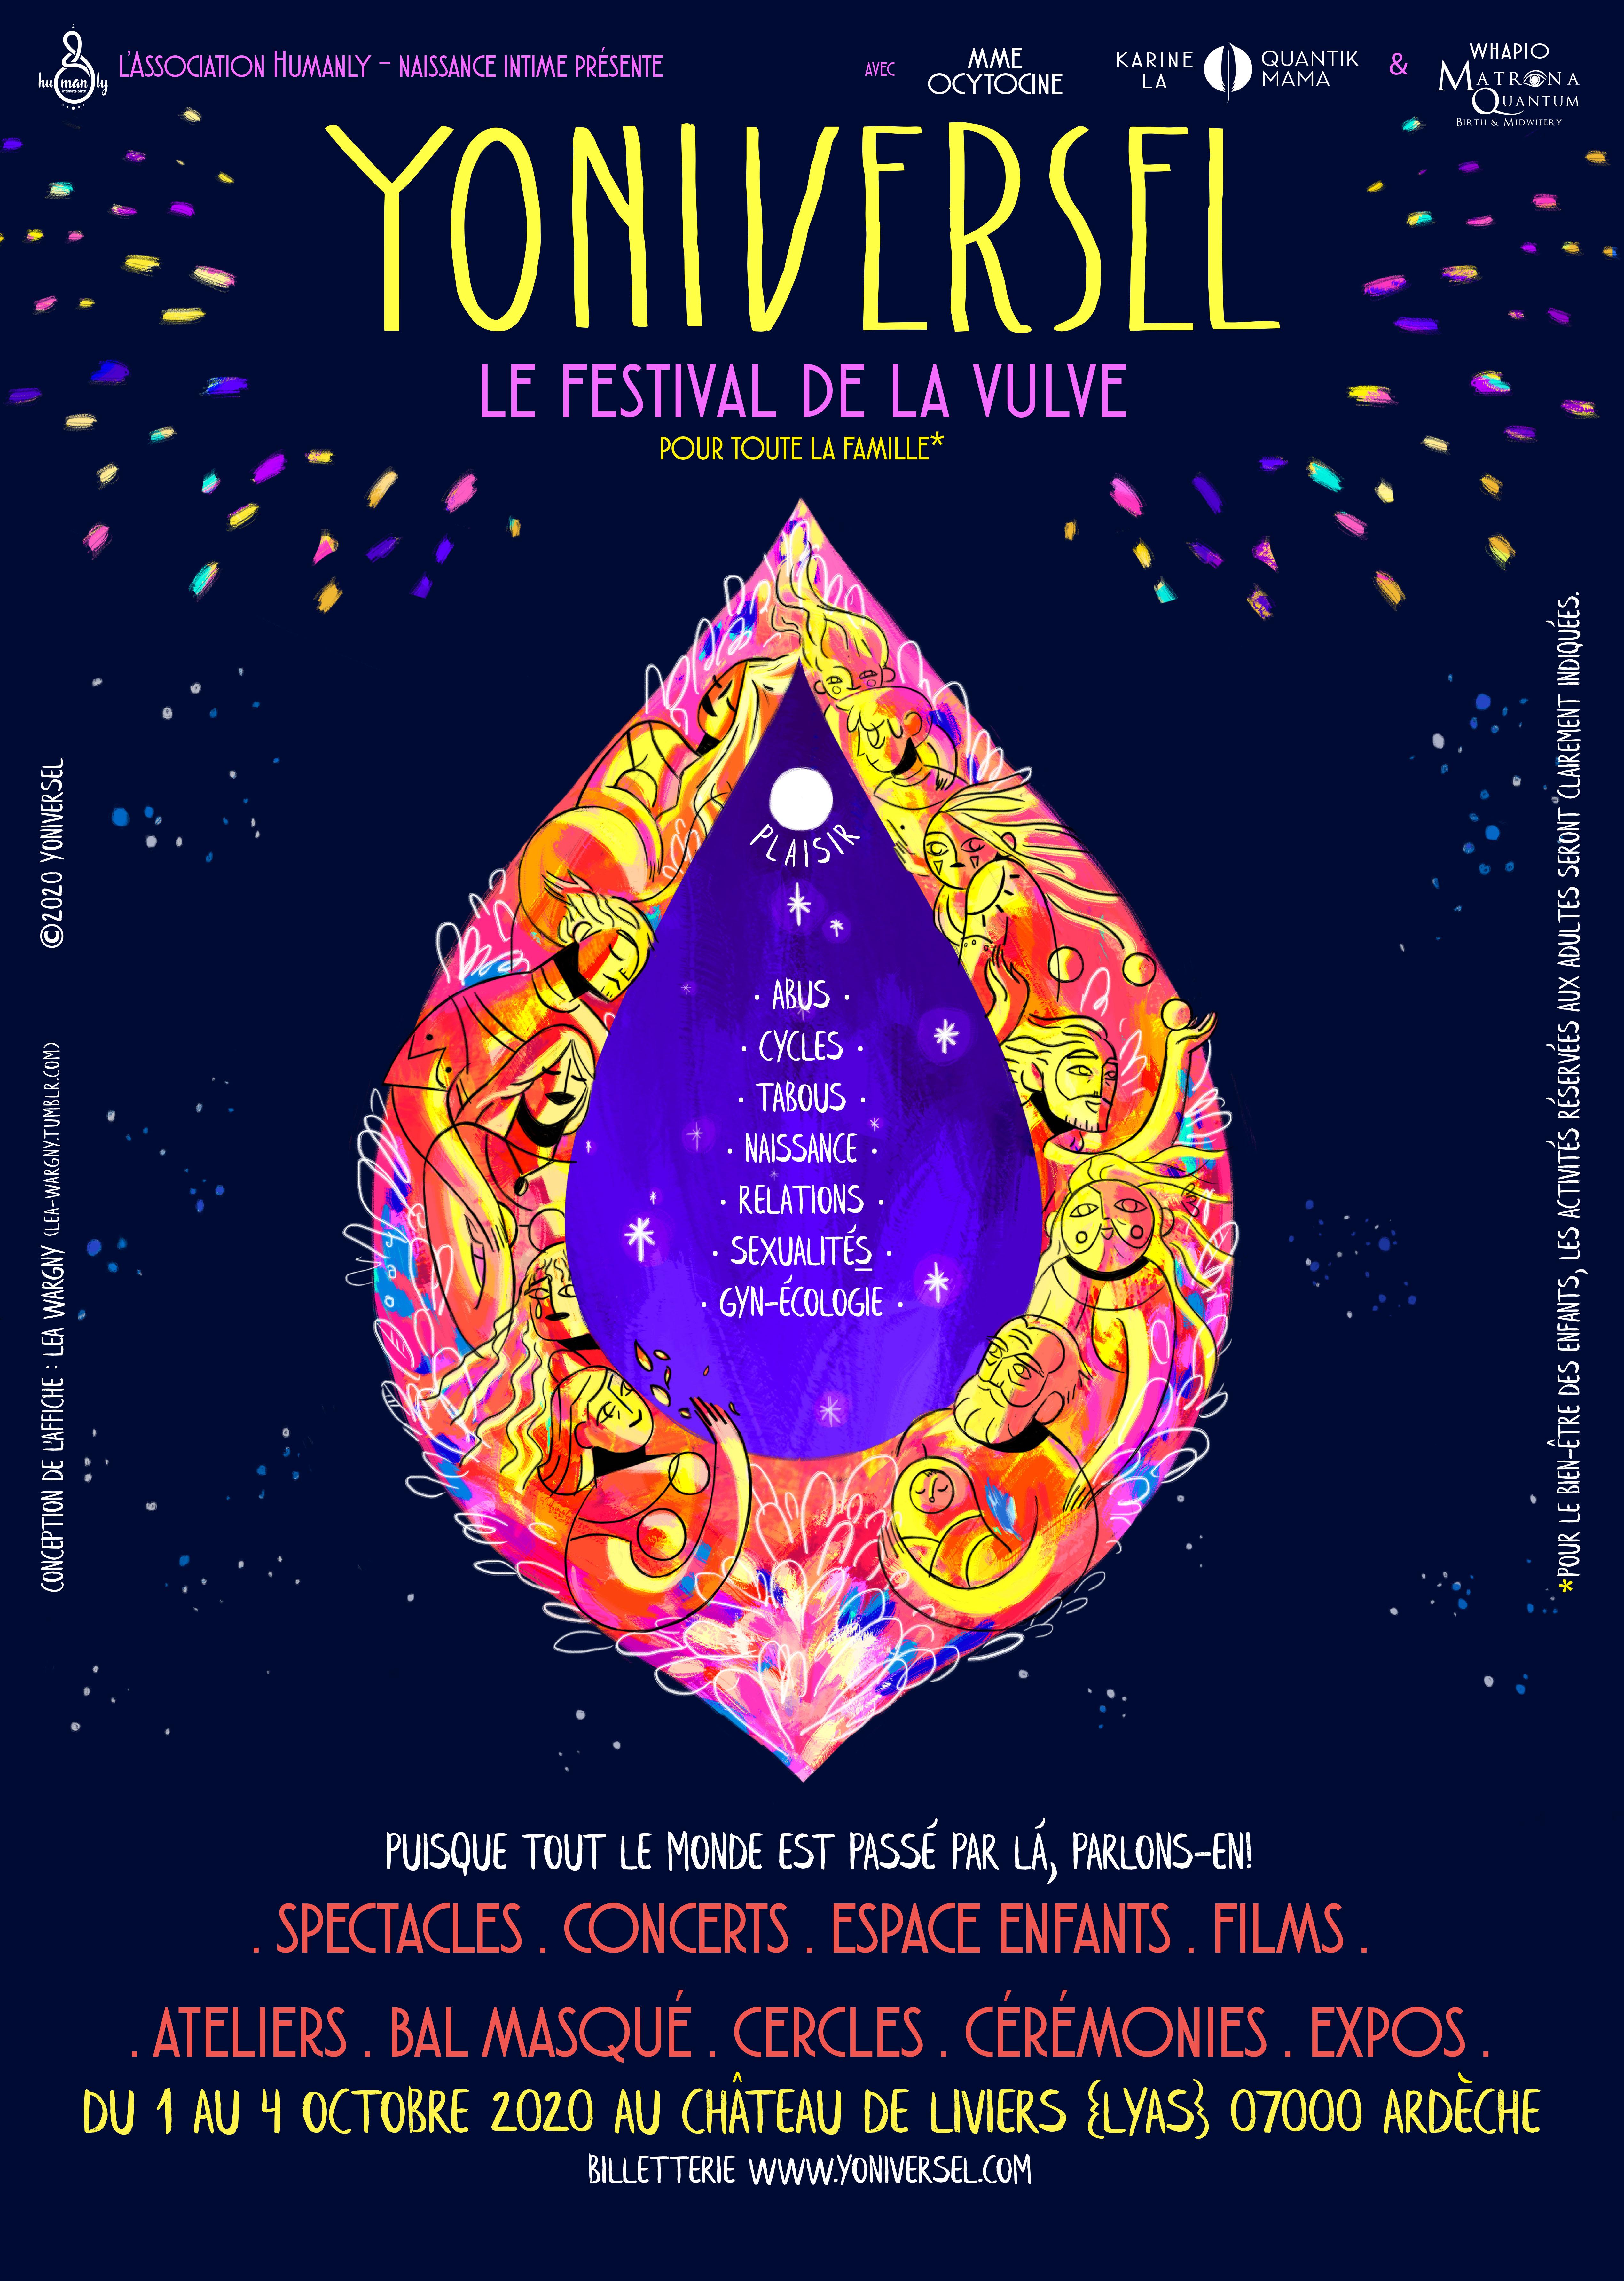 Yoniversel, Festival de la vulve